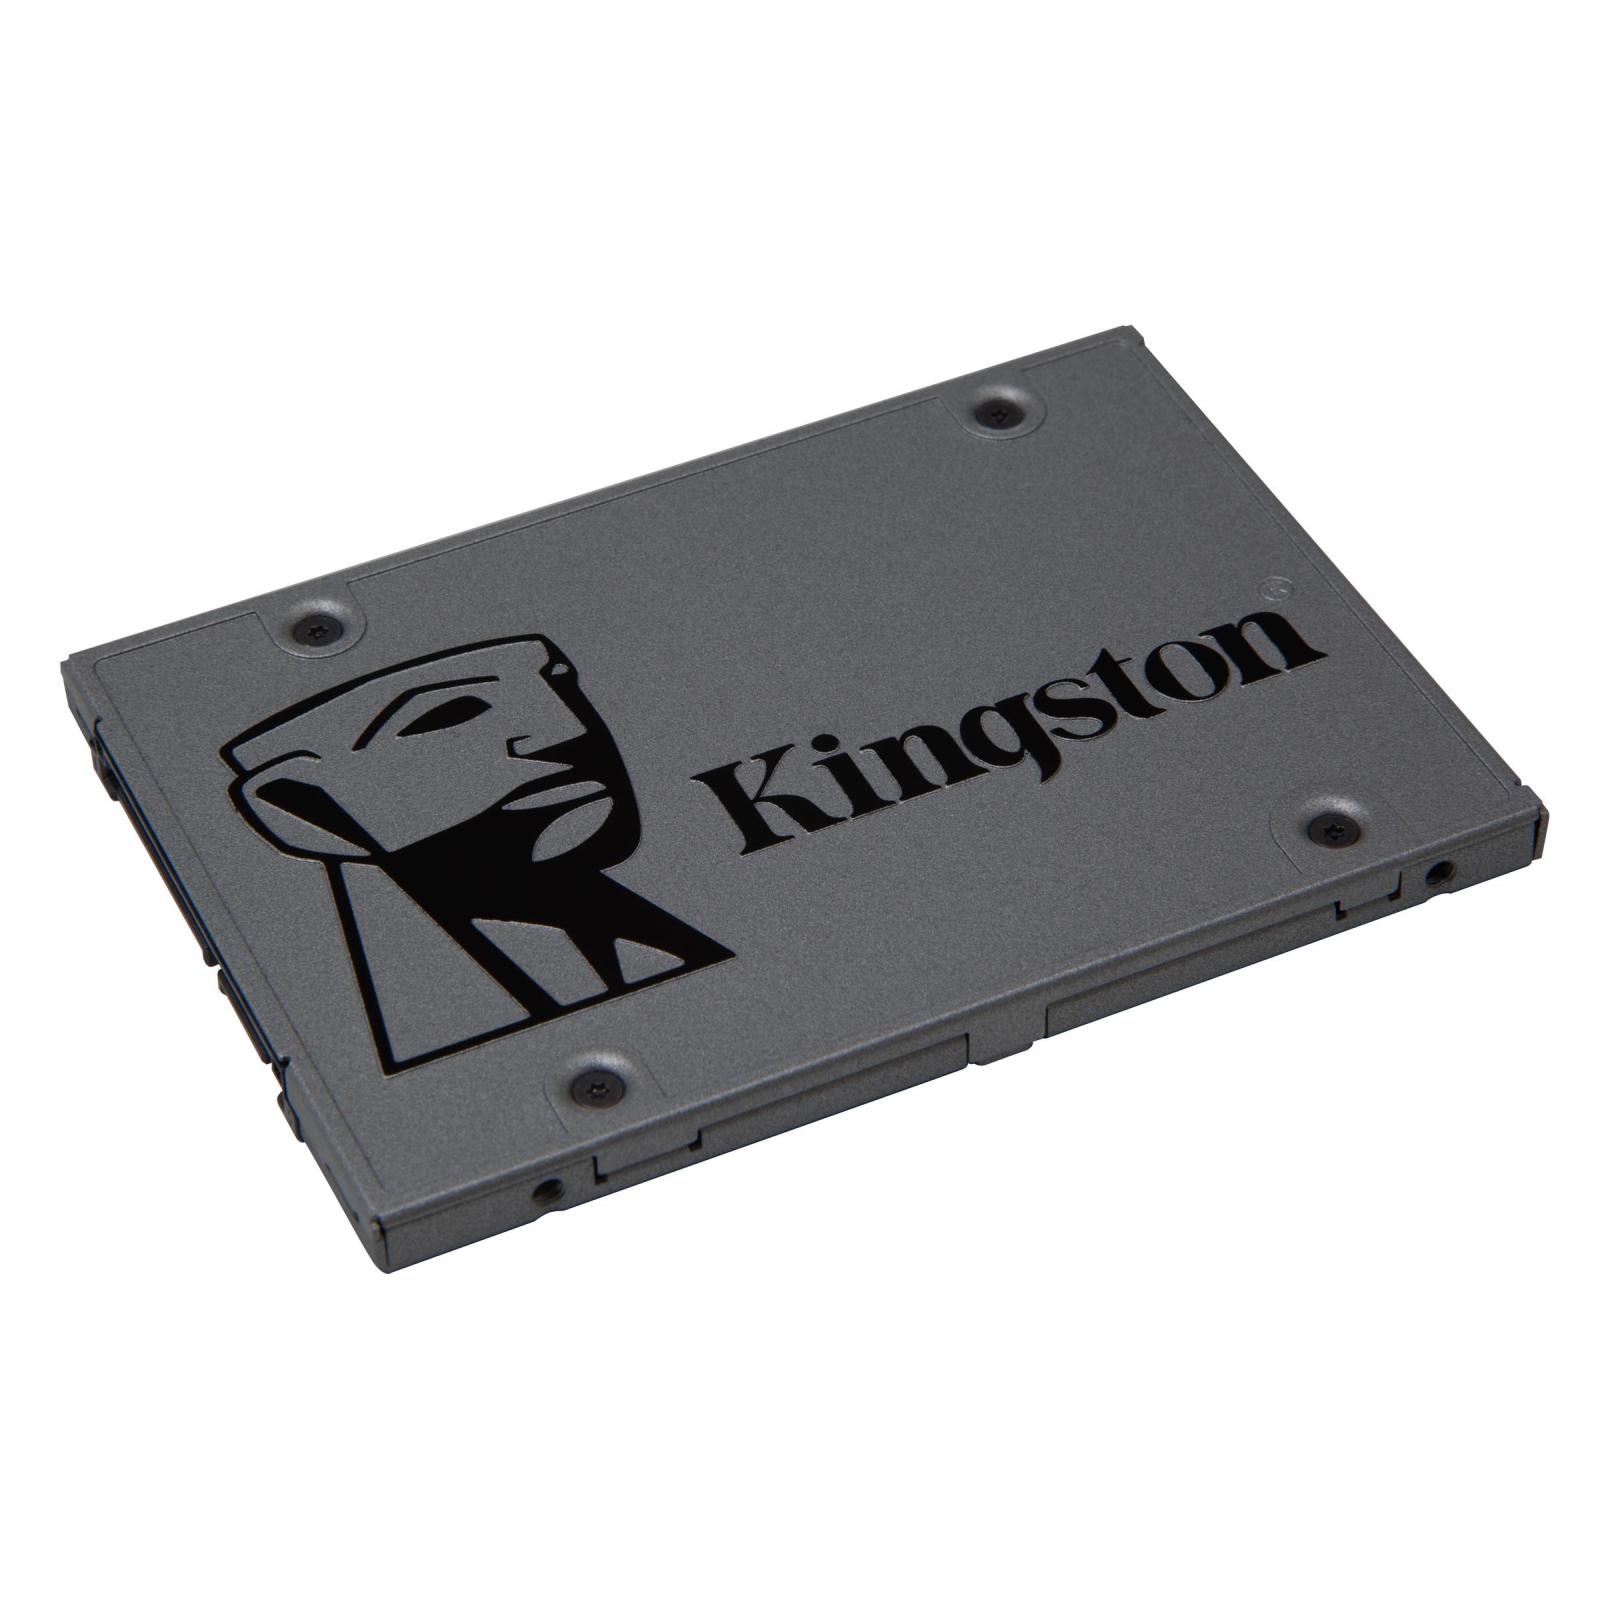 "Накопитель SSD 2.5"" 1.92TB Kingston (SUV500/1920G) изображение 2"